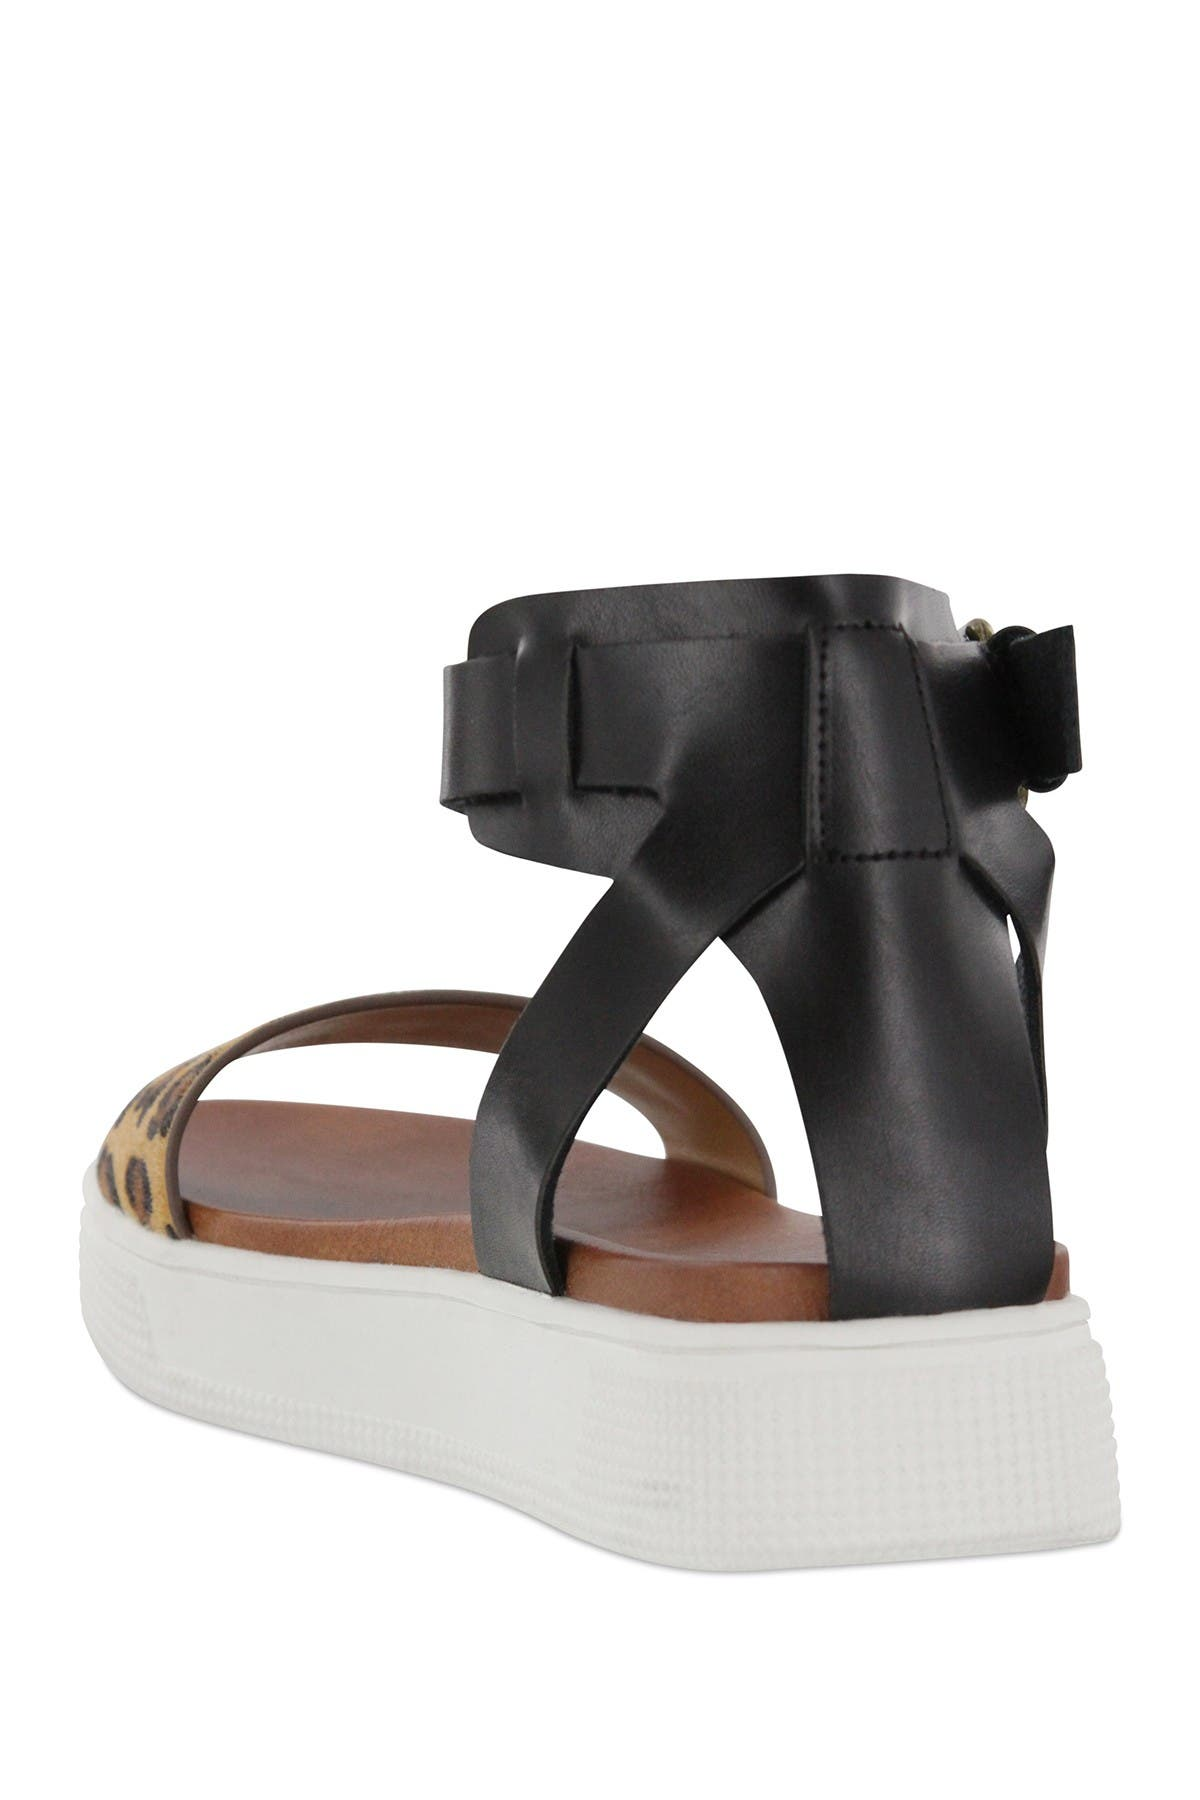 mia ellen platform sandal black